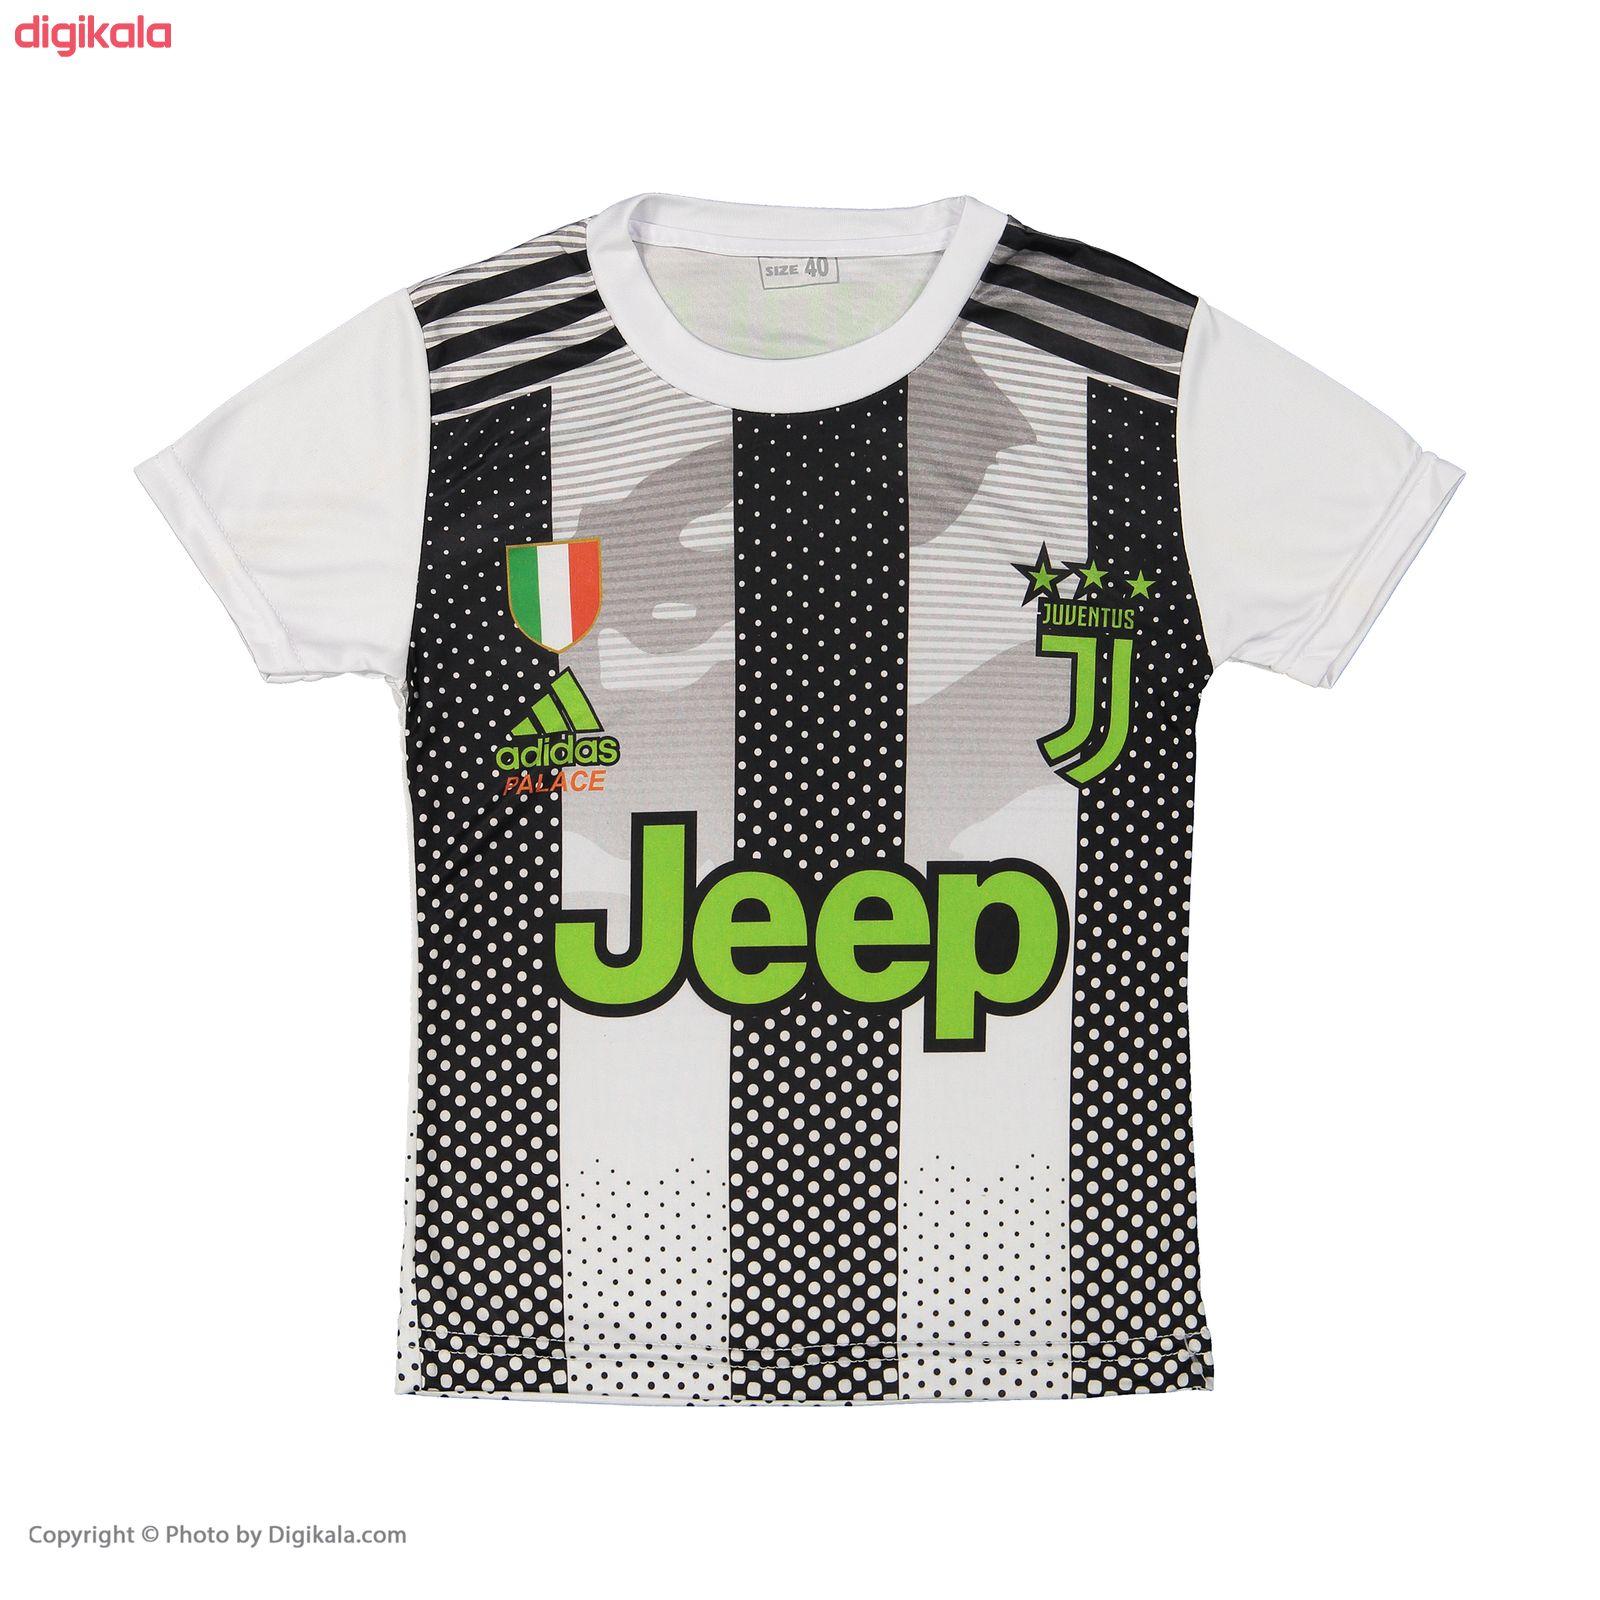 ست پیراهن و شورت ورزشی پسرانه طرح یوونتوس مدل رونالدو کد p.sh.007 main 1 1